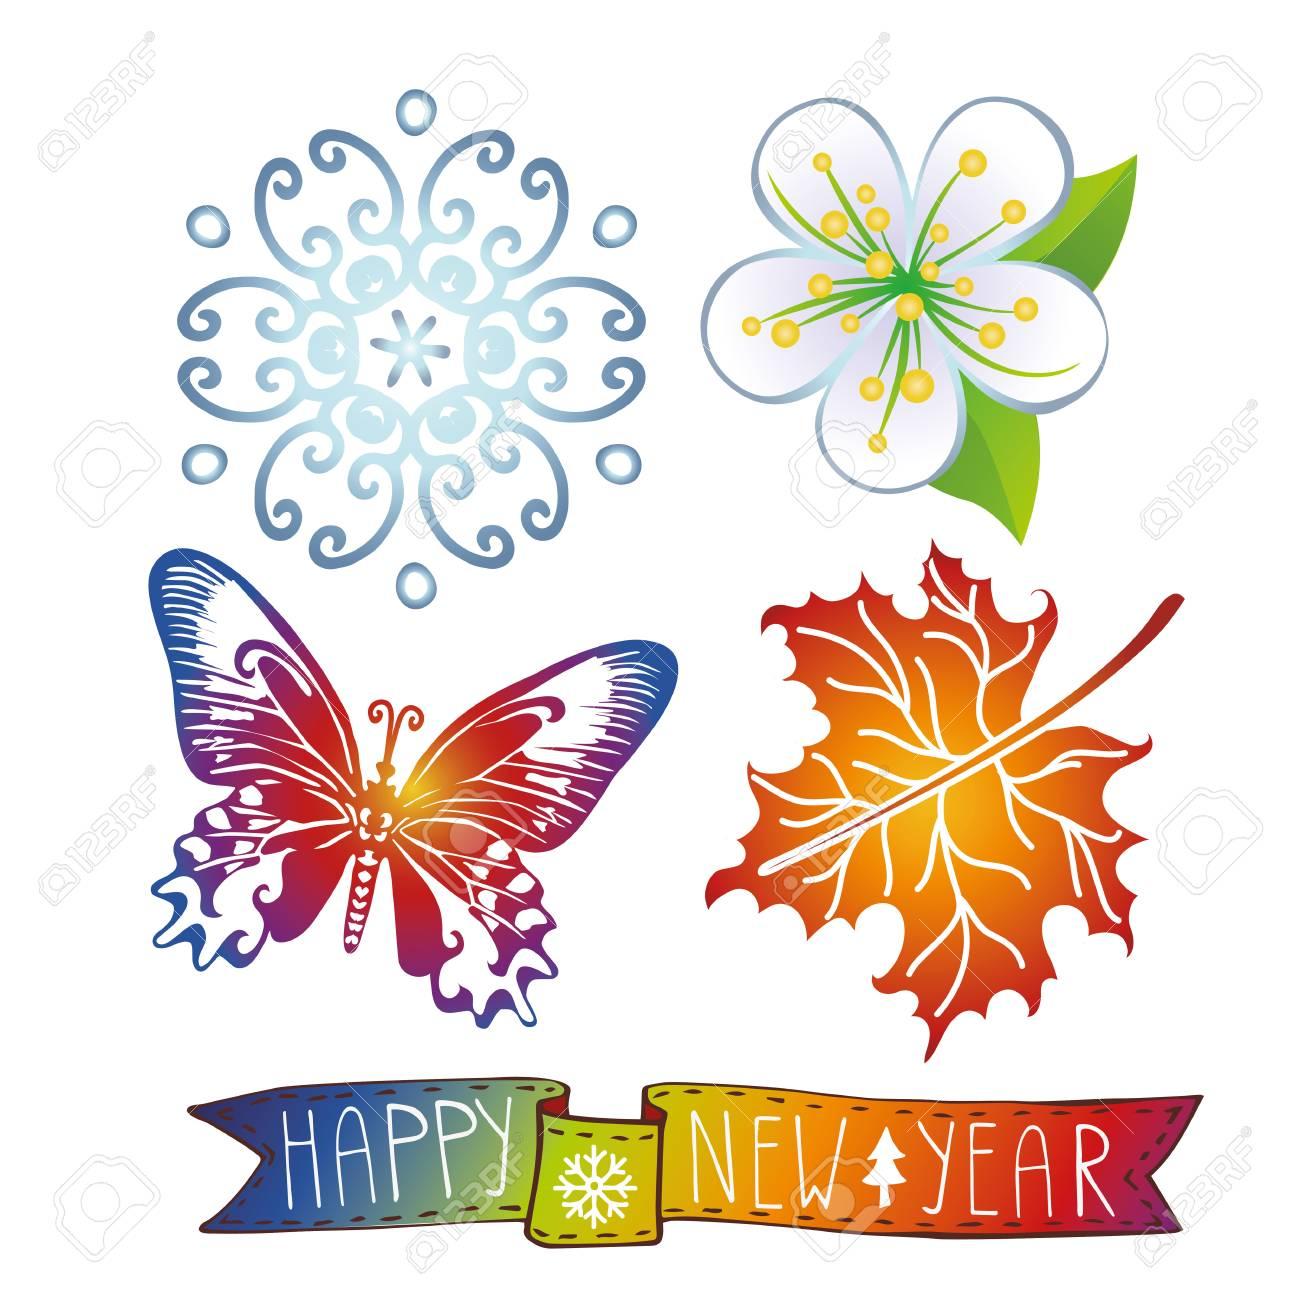 Happy New Year Icons Seteeting Cardinvitationbannermbols